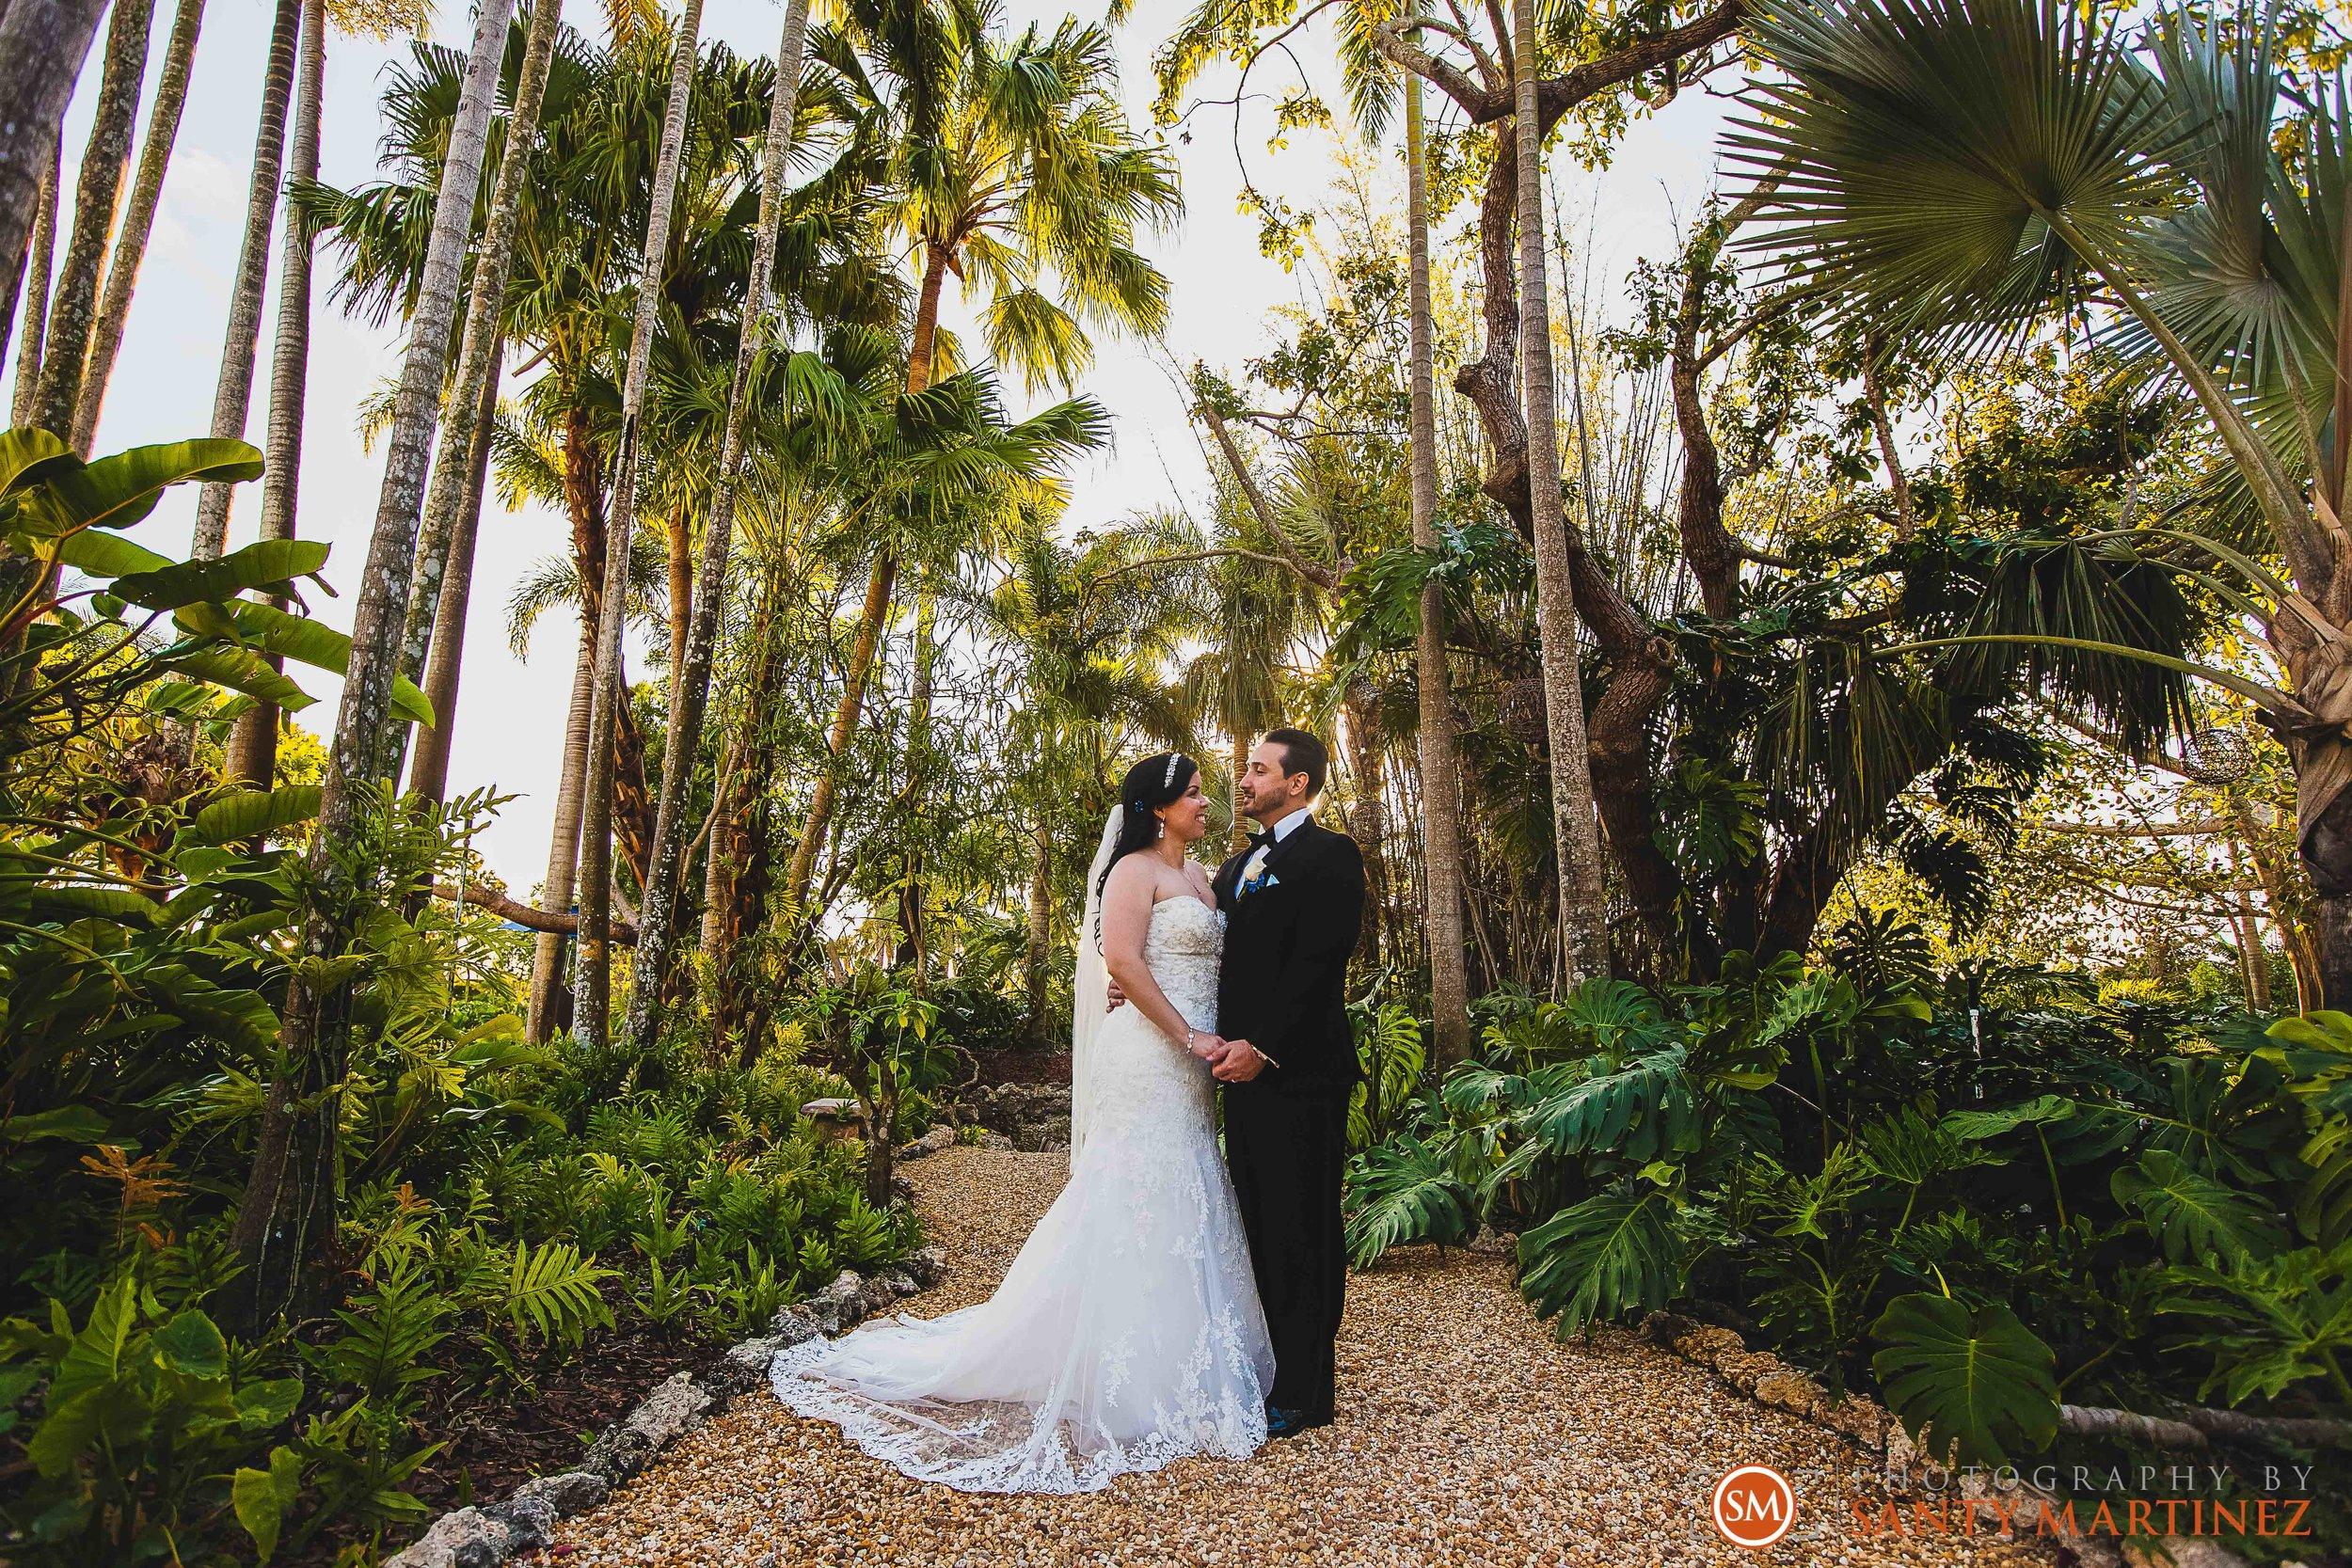 Wedding - Whimsical key West House - Photography by Santy Martinez-31.jpg